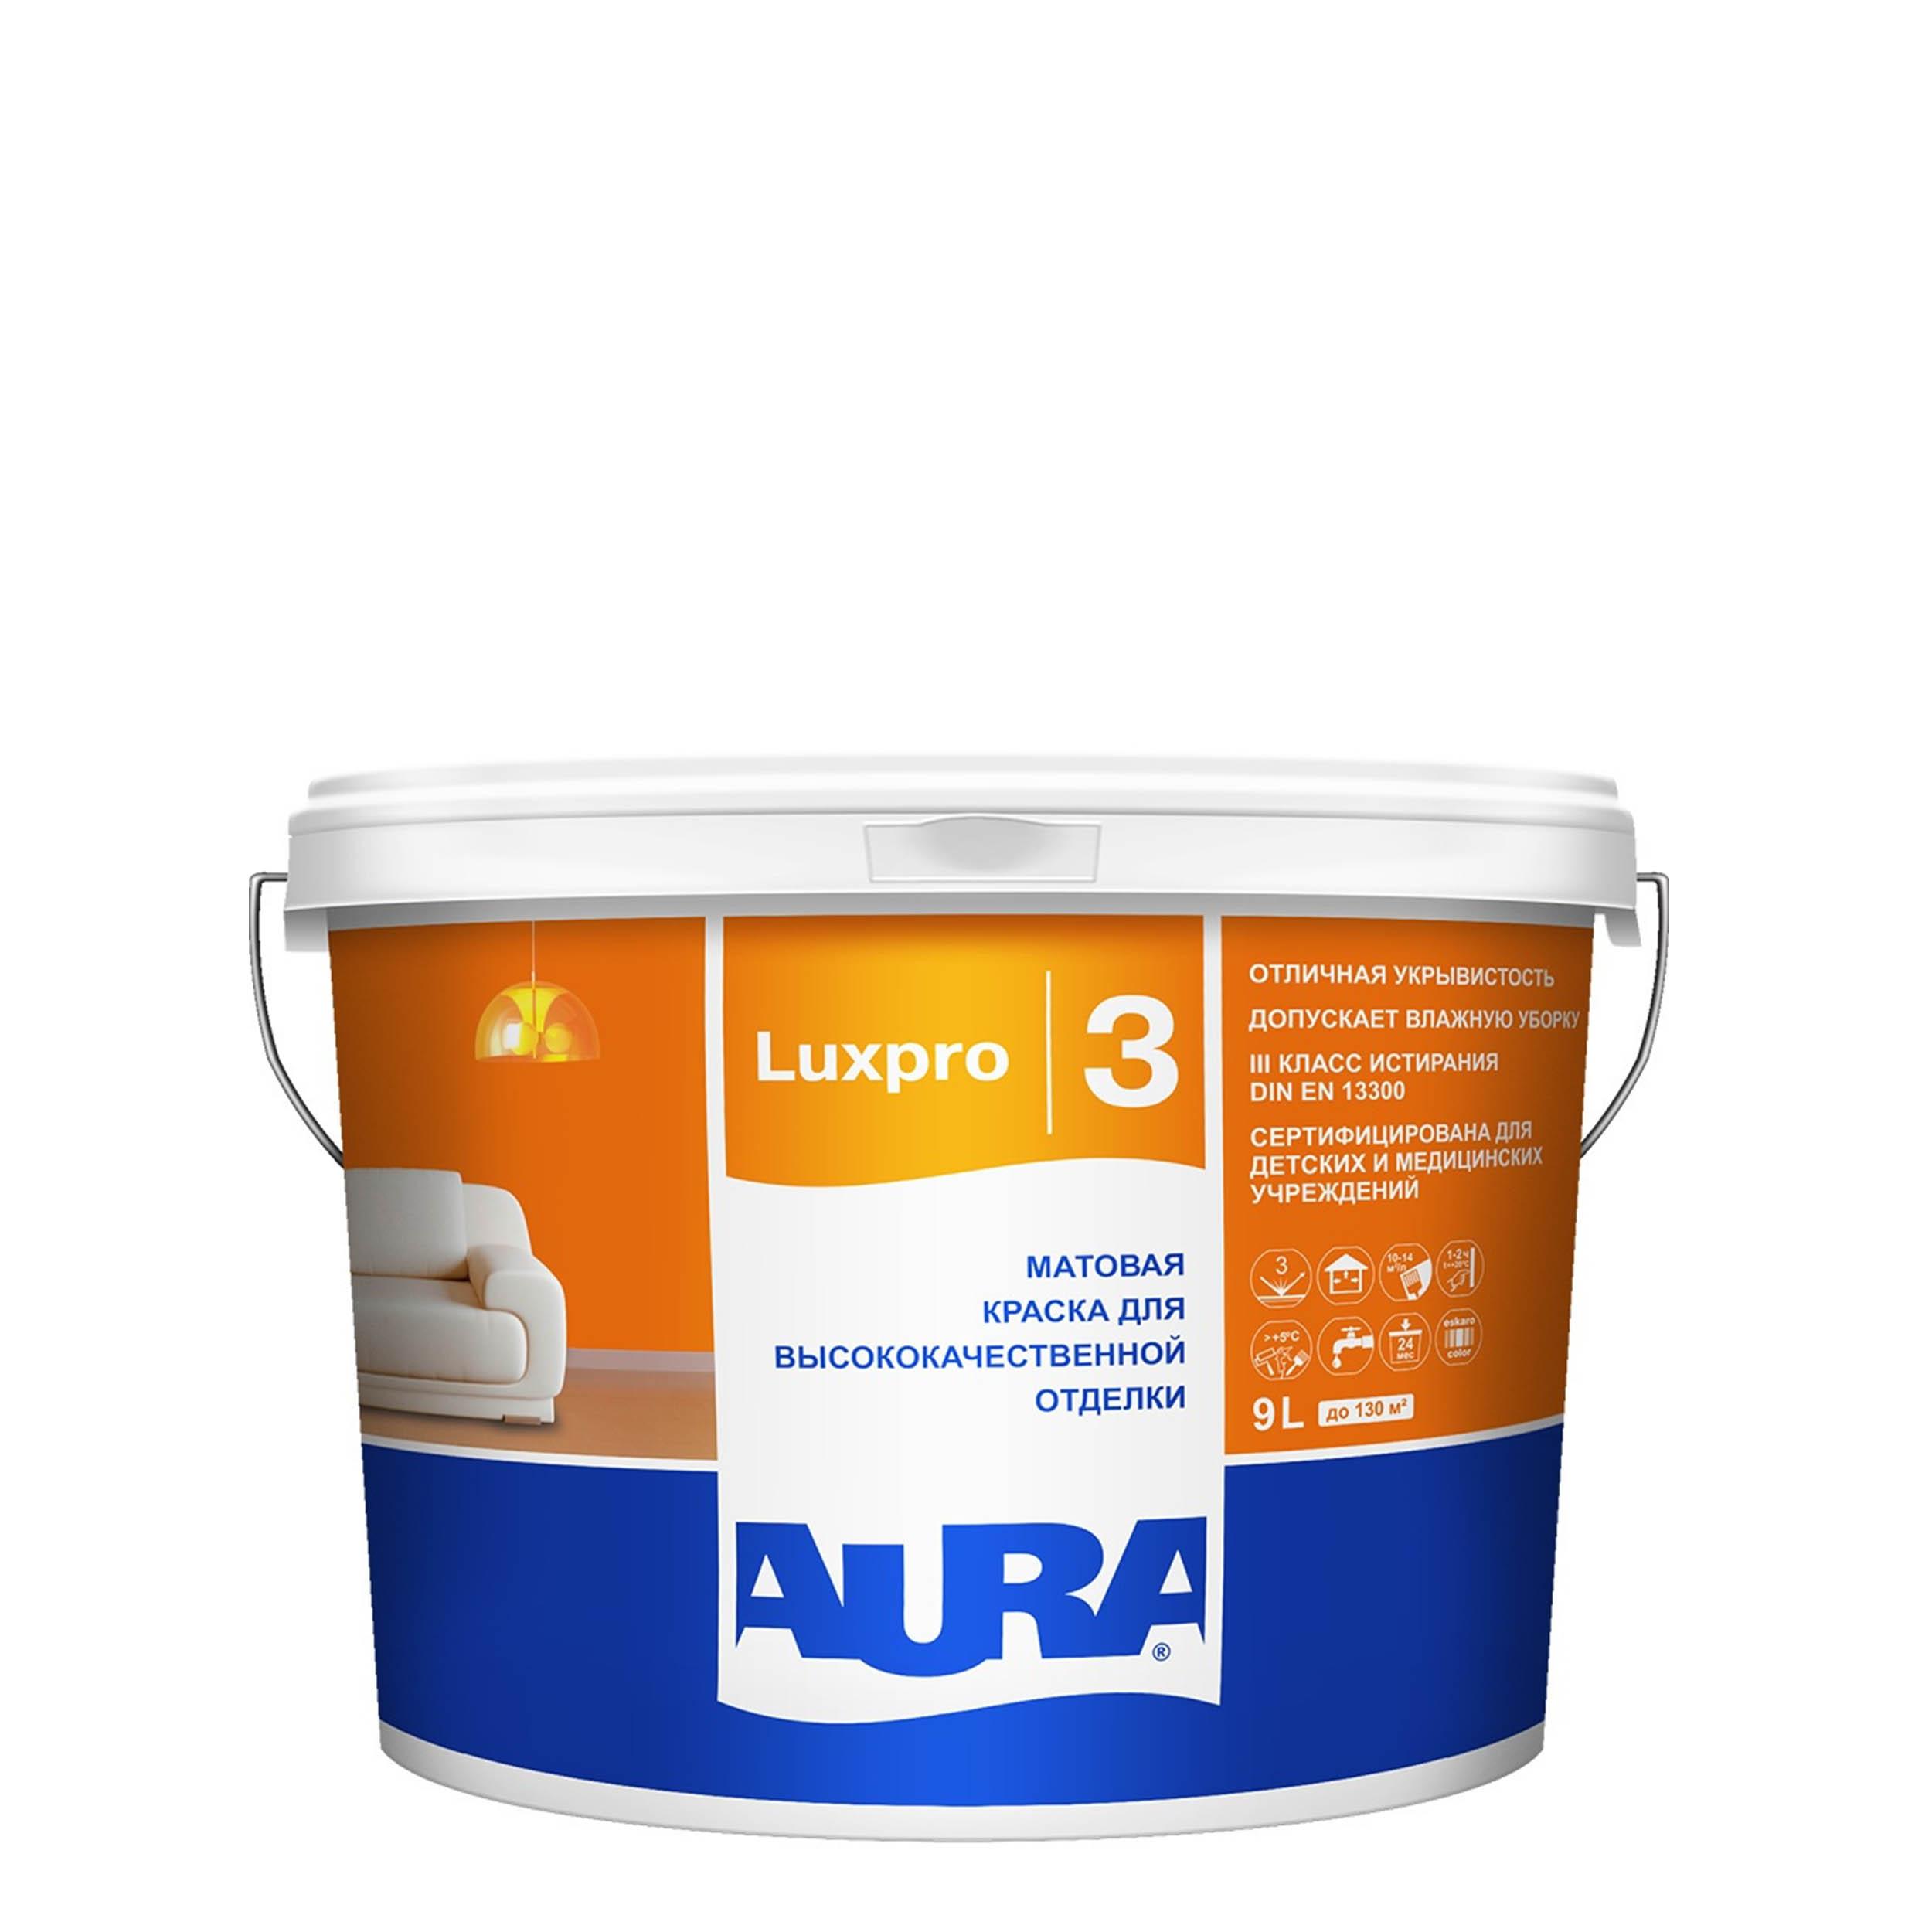 Фото 4 - Краска интерьерная, Aura LuxPRO 3, RAL 9001, 11 кг.